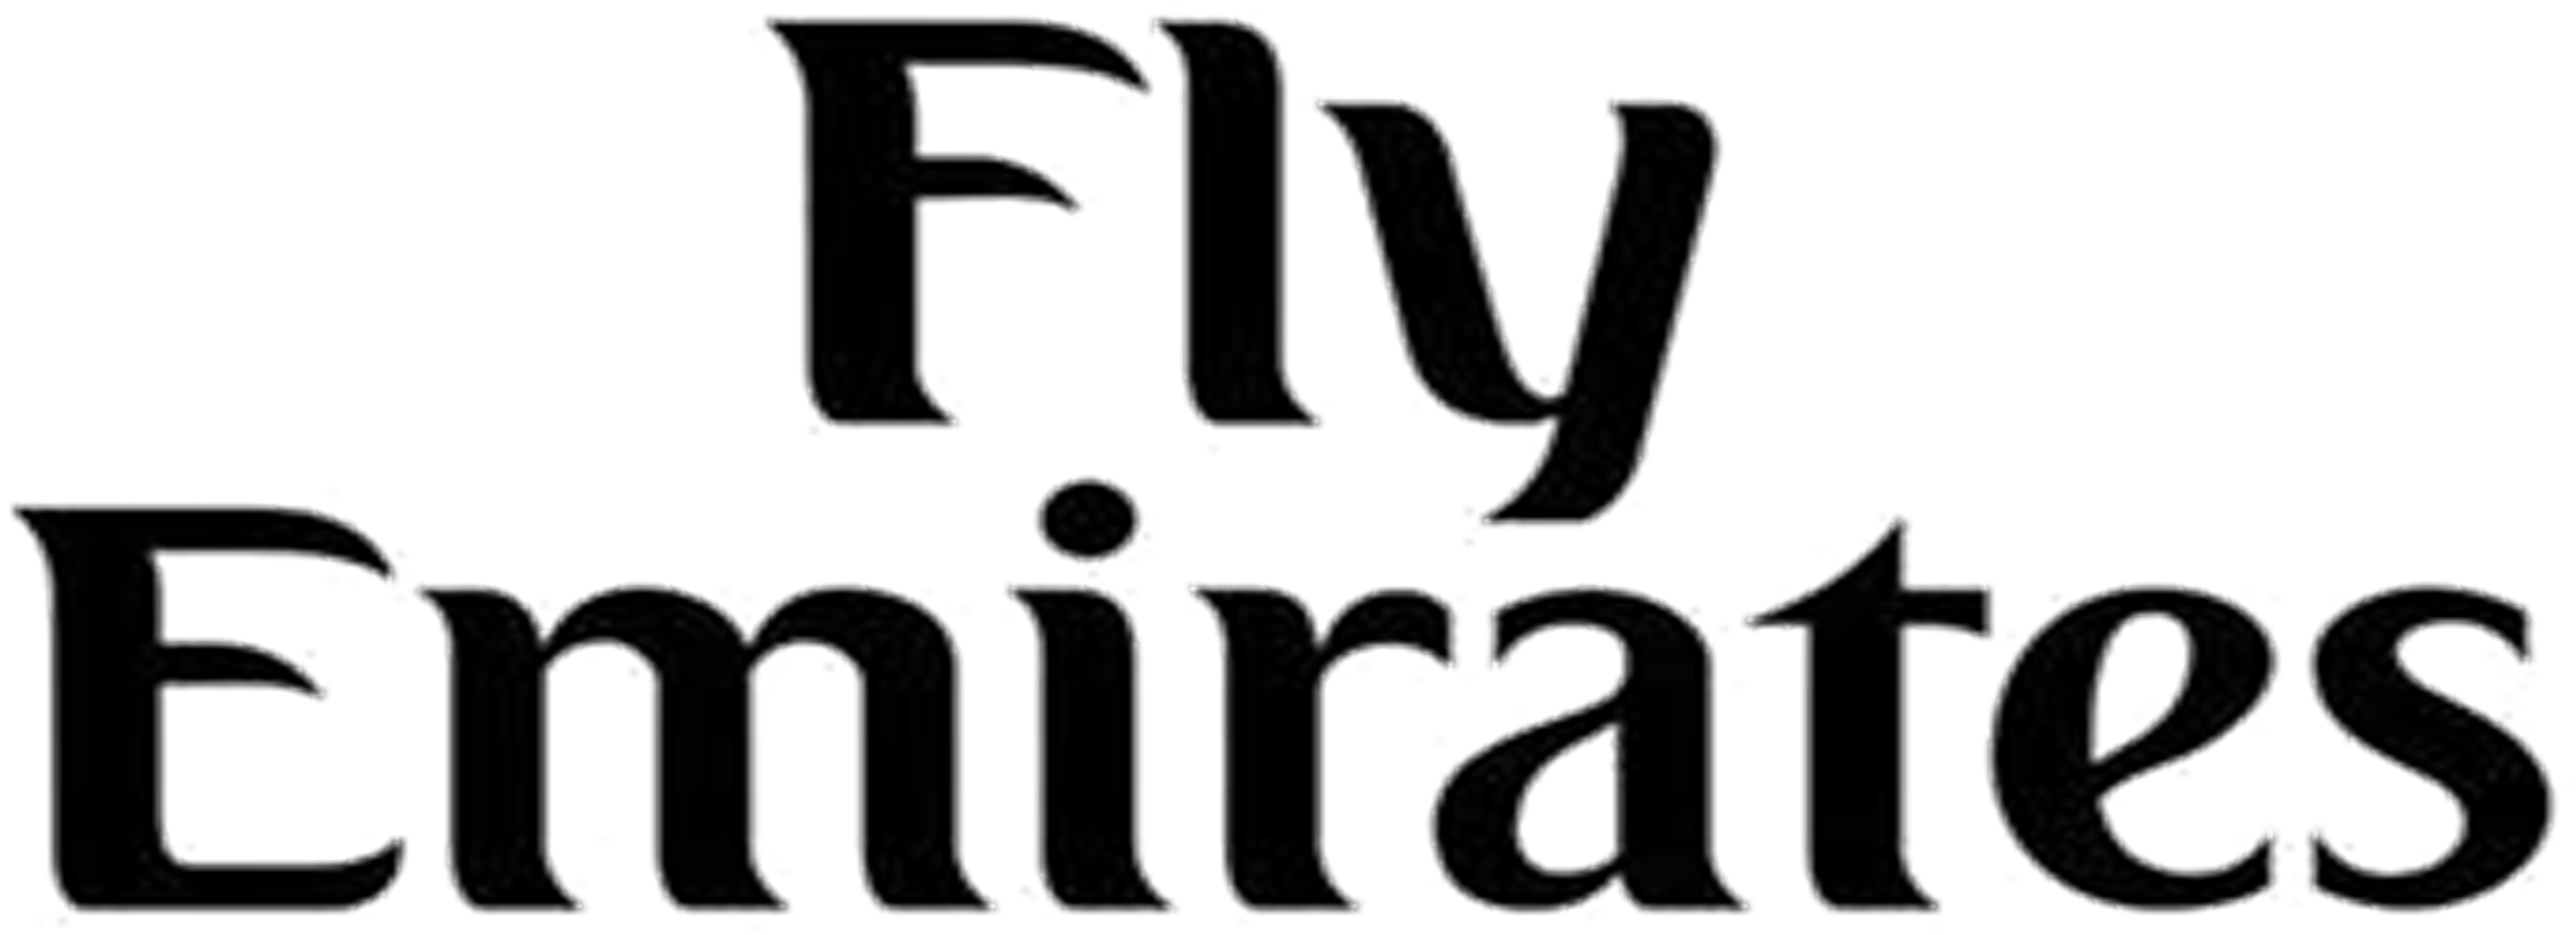 Download Hd Emirates Logo Transparent Dede14 Emirates Logo Png R Madrid Fly Emirates Transparent Png Image Nicepng Com